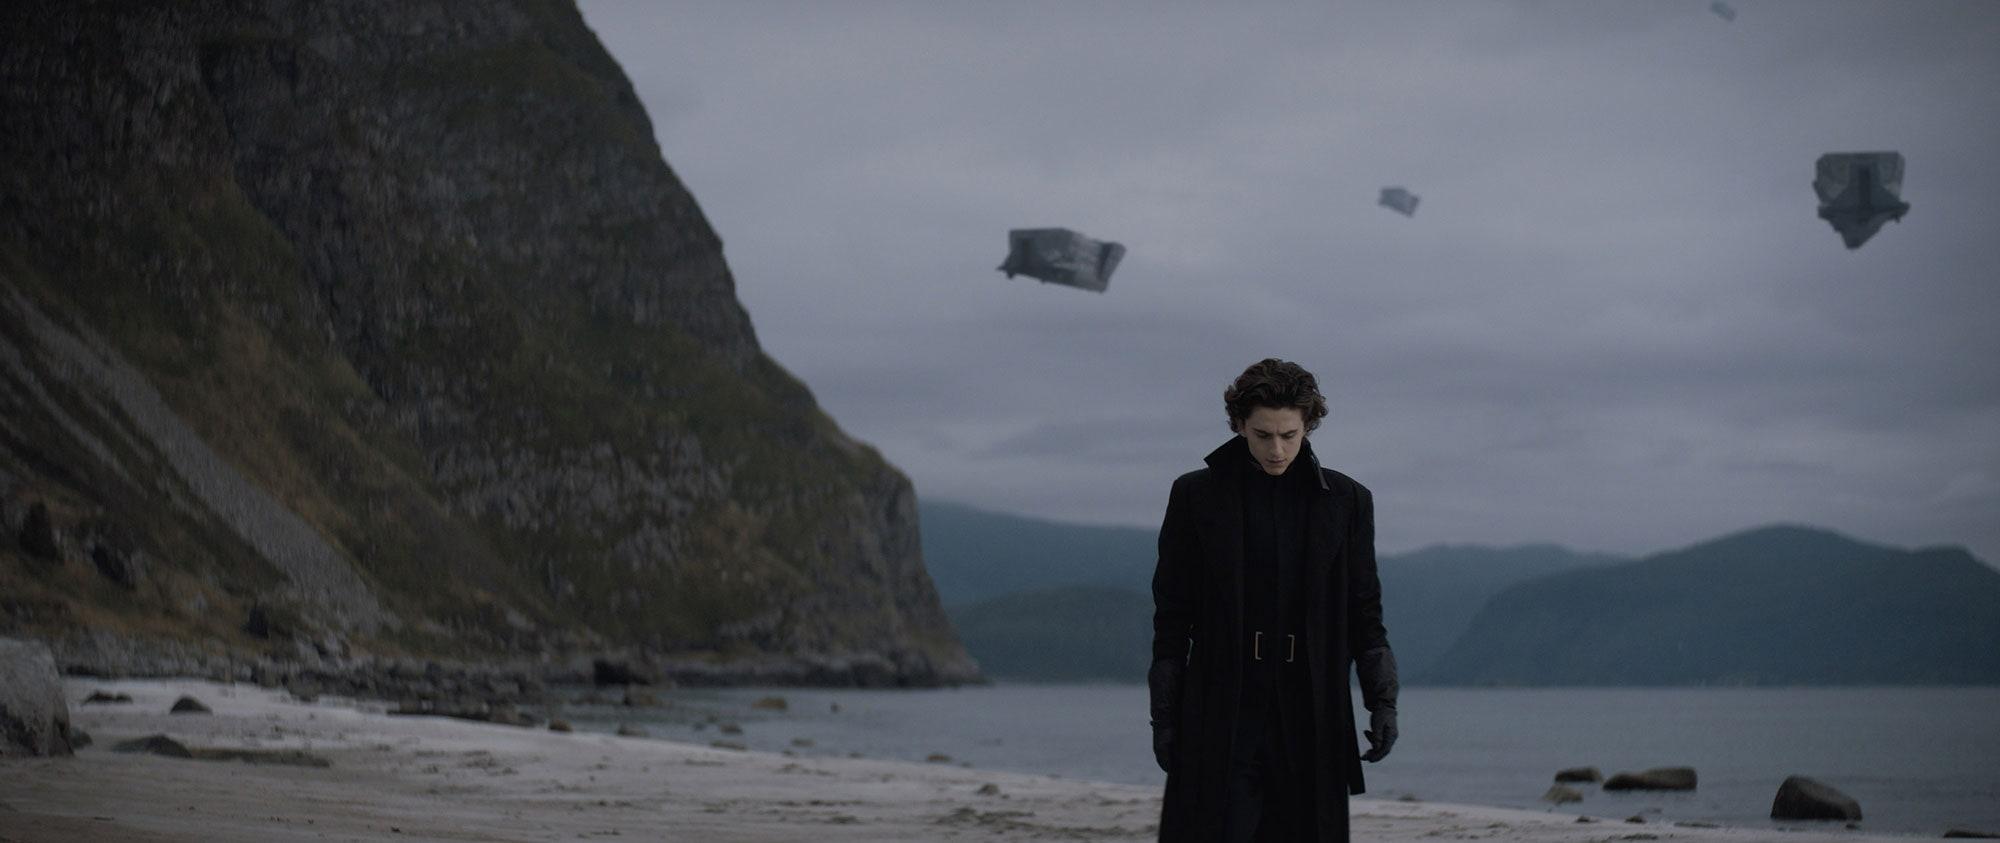 Dune 2020 - Timothee Chalamet as Paul Atreides